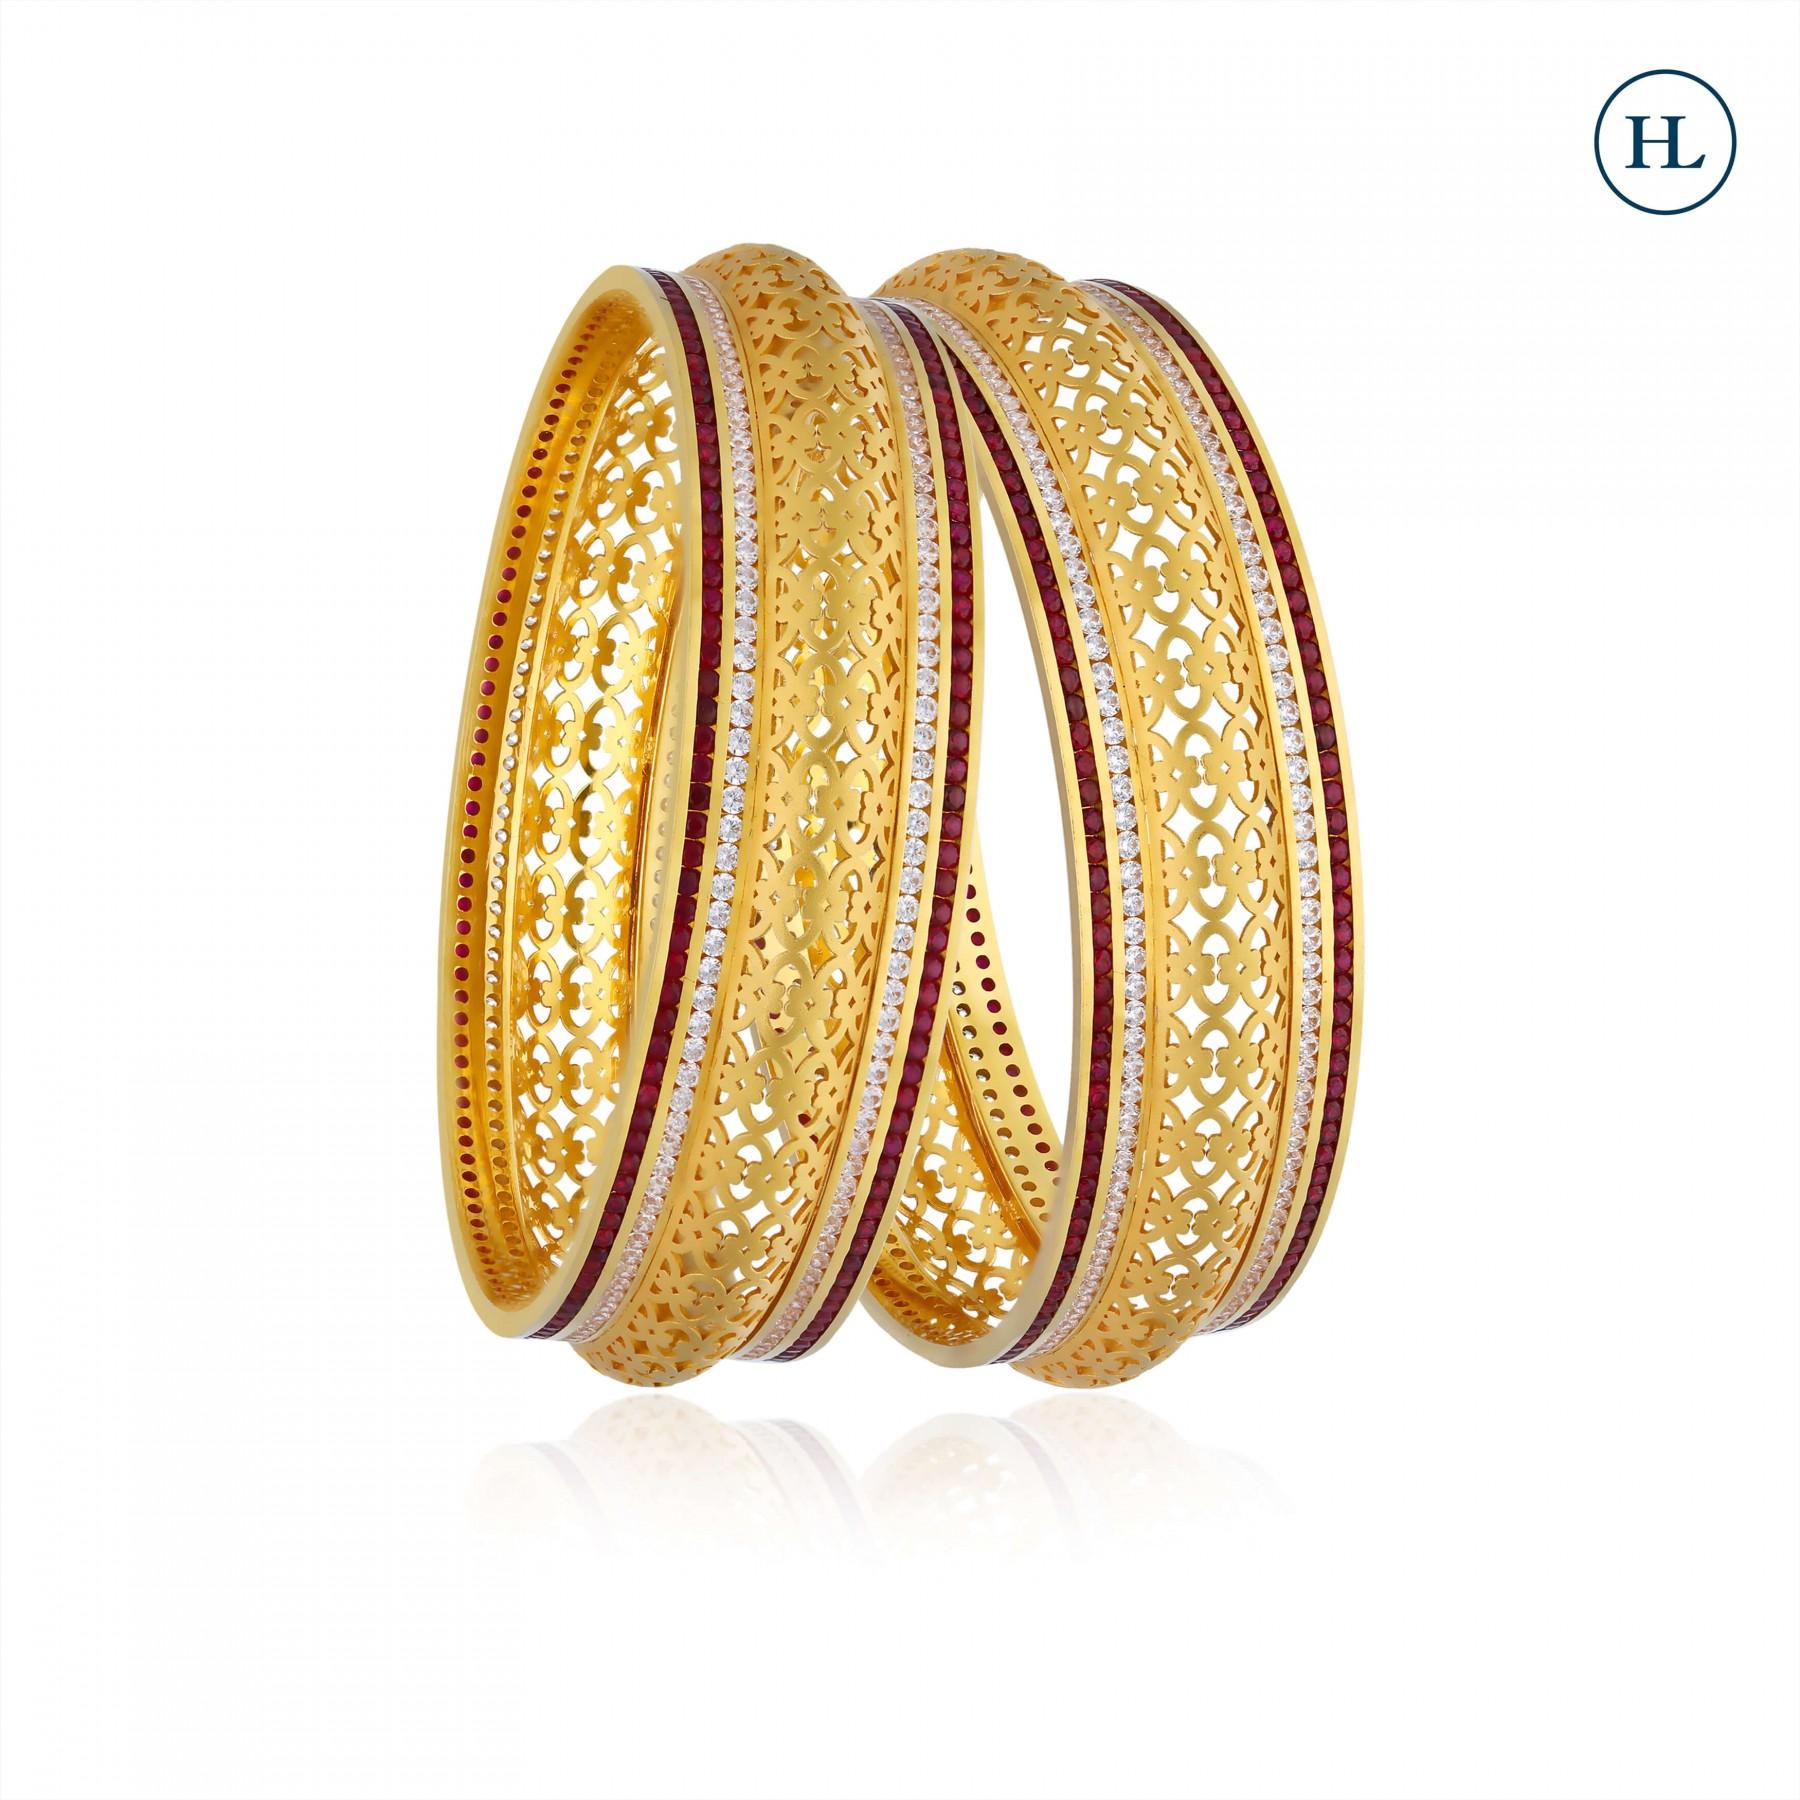 Zircon Gold Bangle Pair